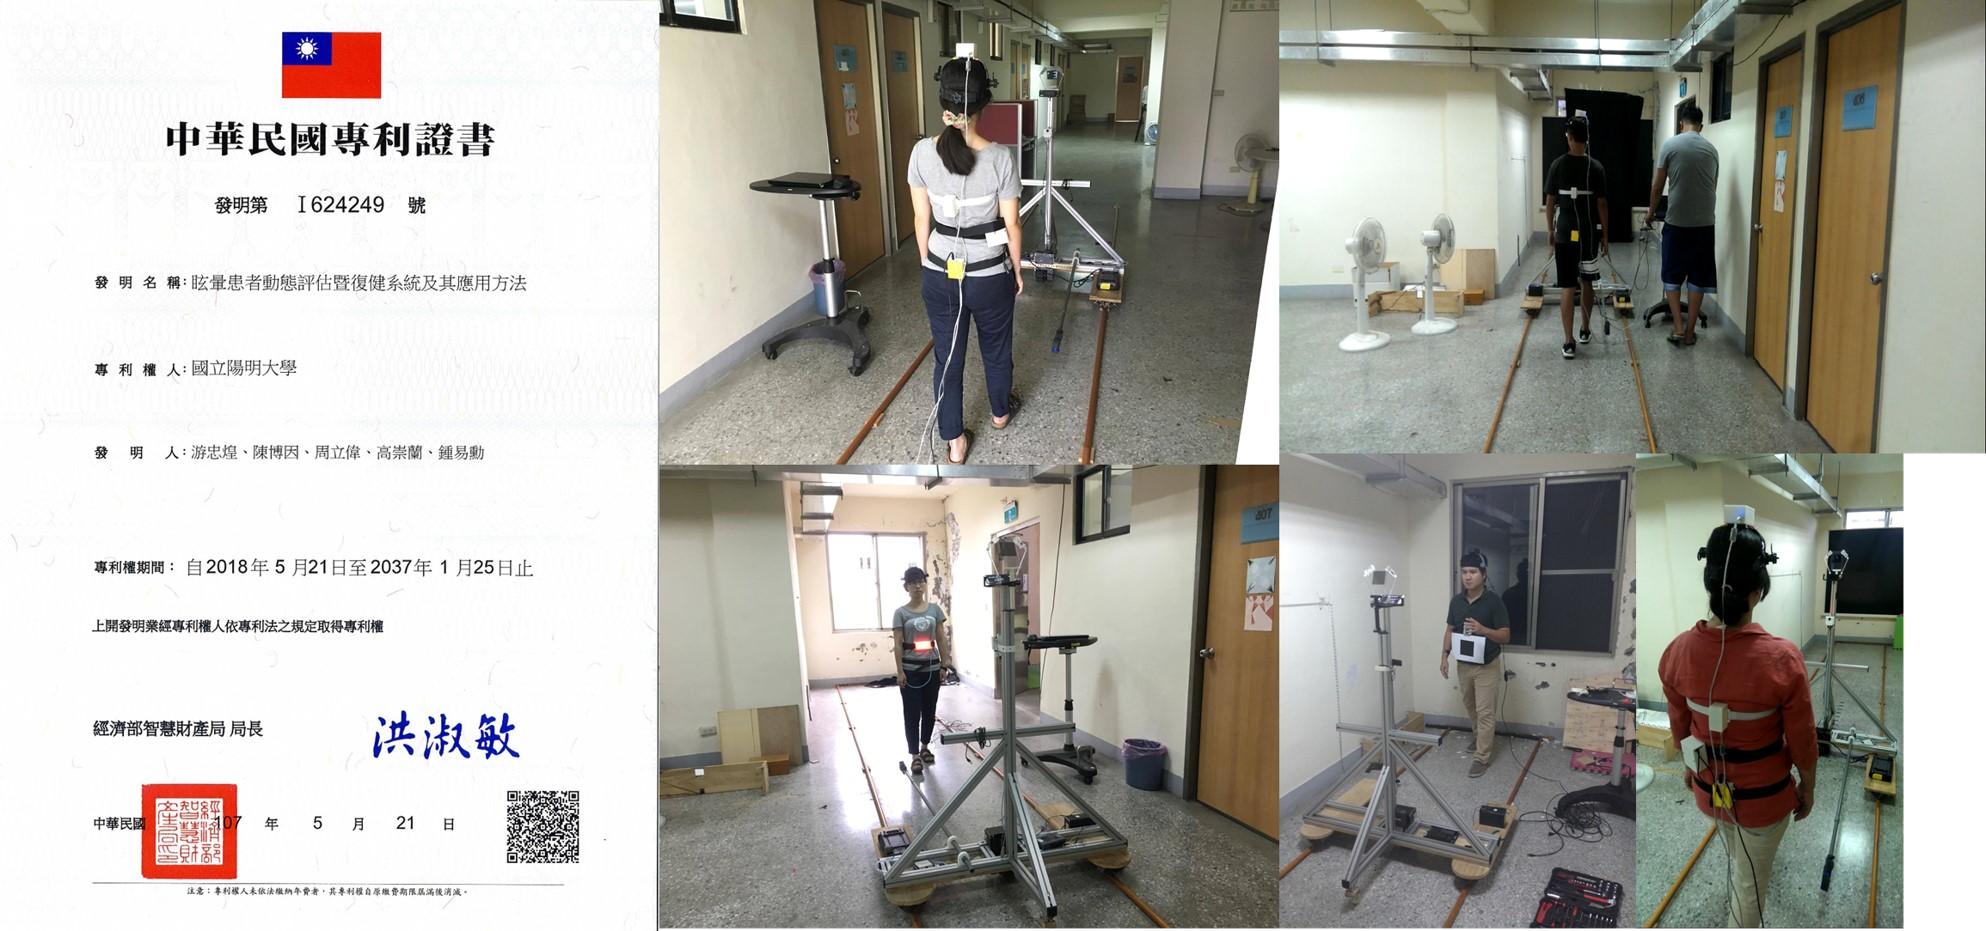 EvaluationTraining of Vestibular, Visual, Postural alignmentGait Stability during Over-ground Walking